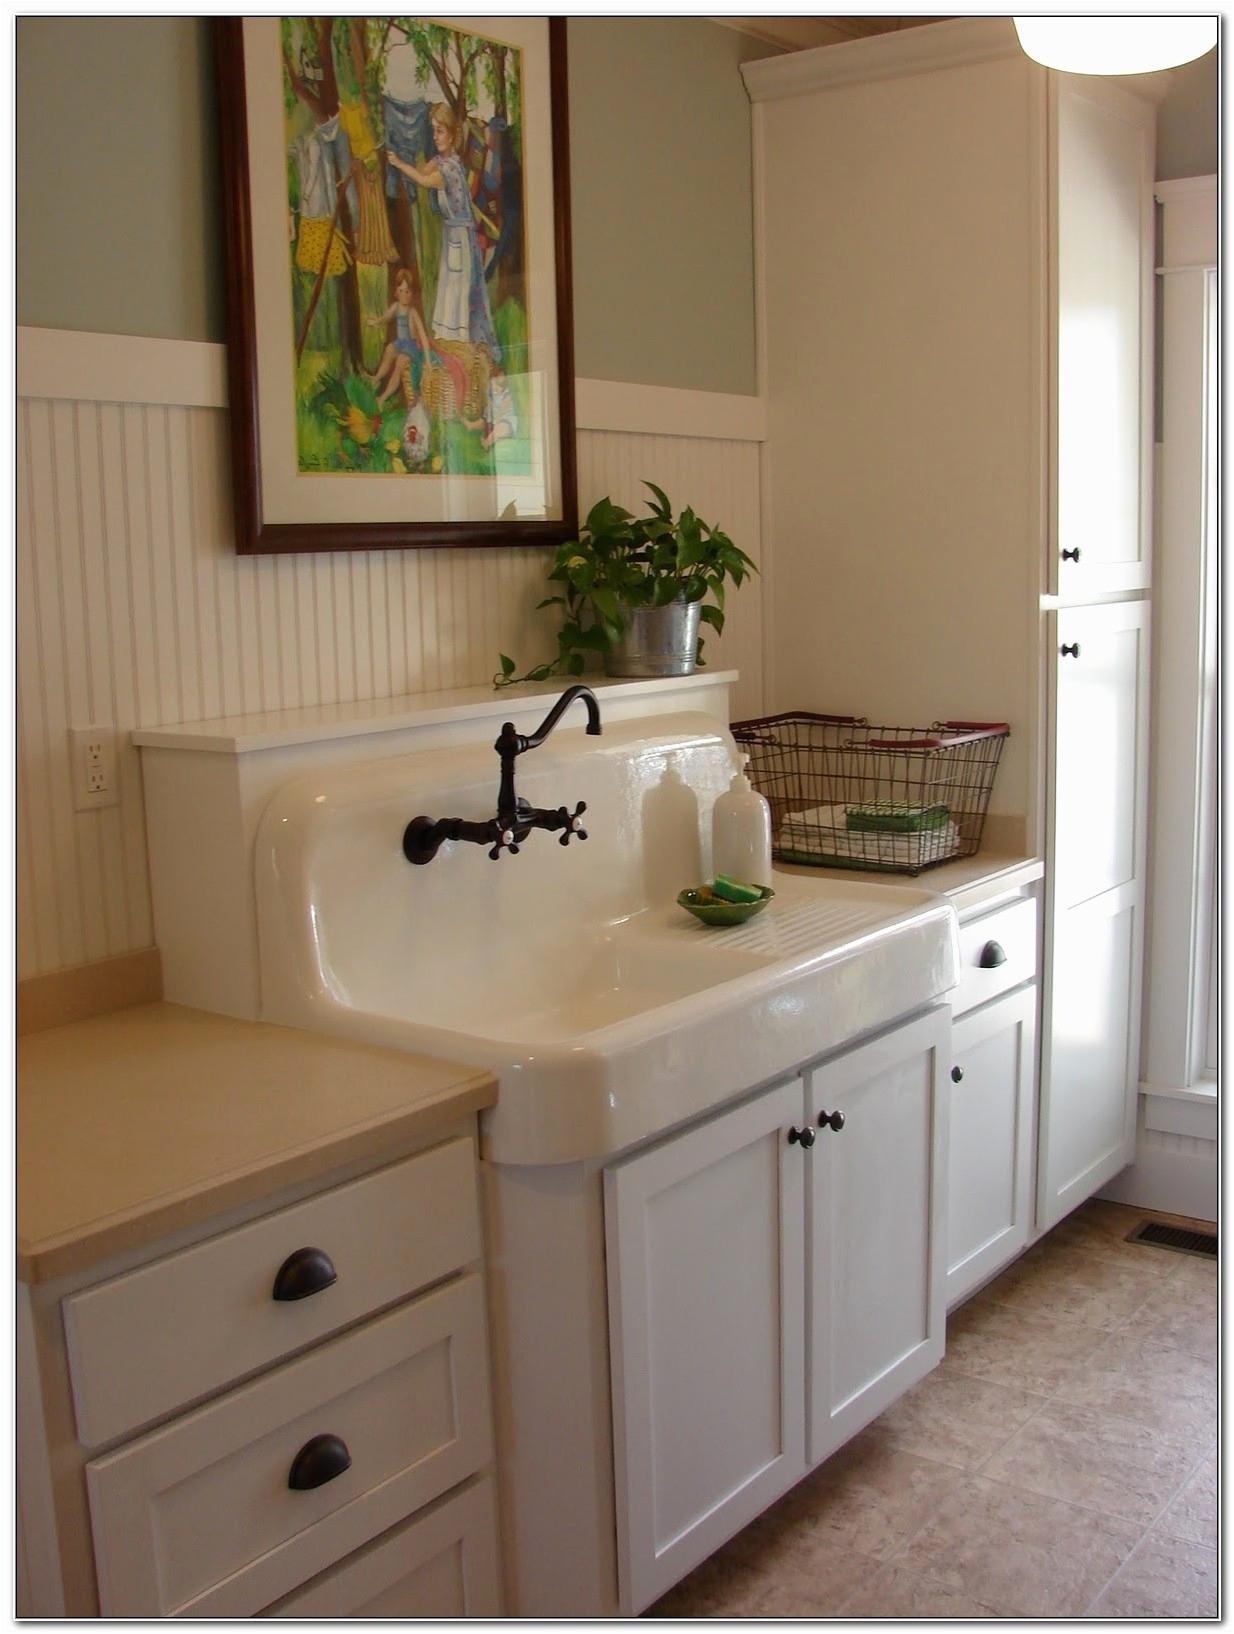 Beauteous Kitchen Remodeling Ideas In Cheap Kitchen Remodel Hd Vintage Sinkh Sink Farmhouse Sinks Sinki 0d